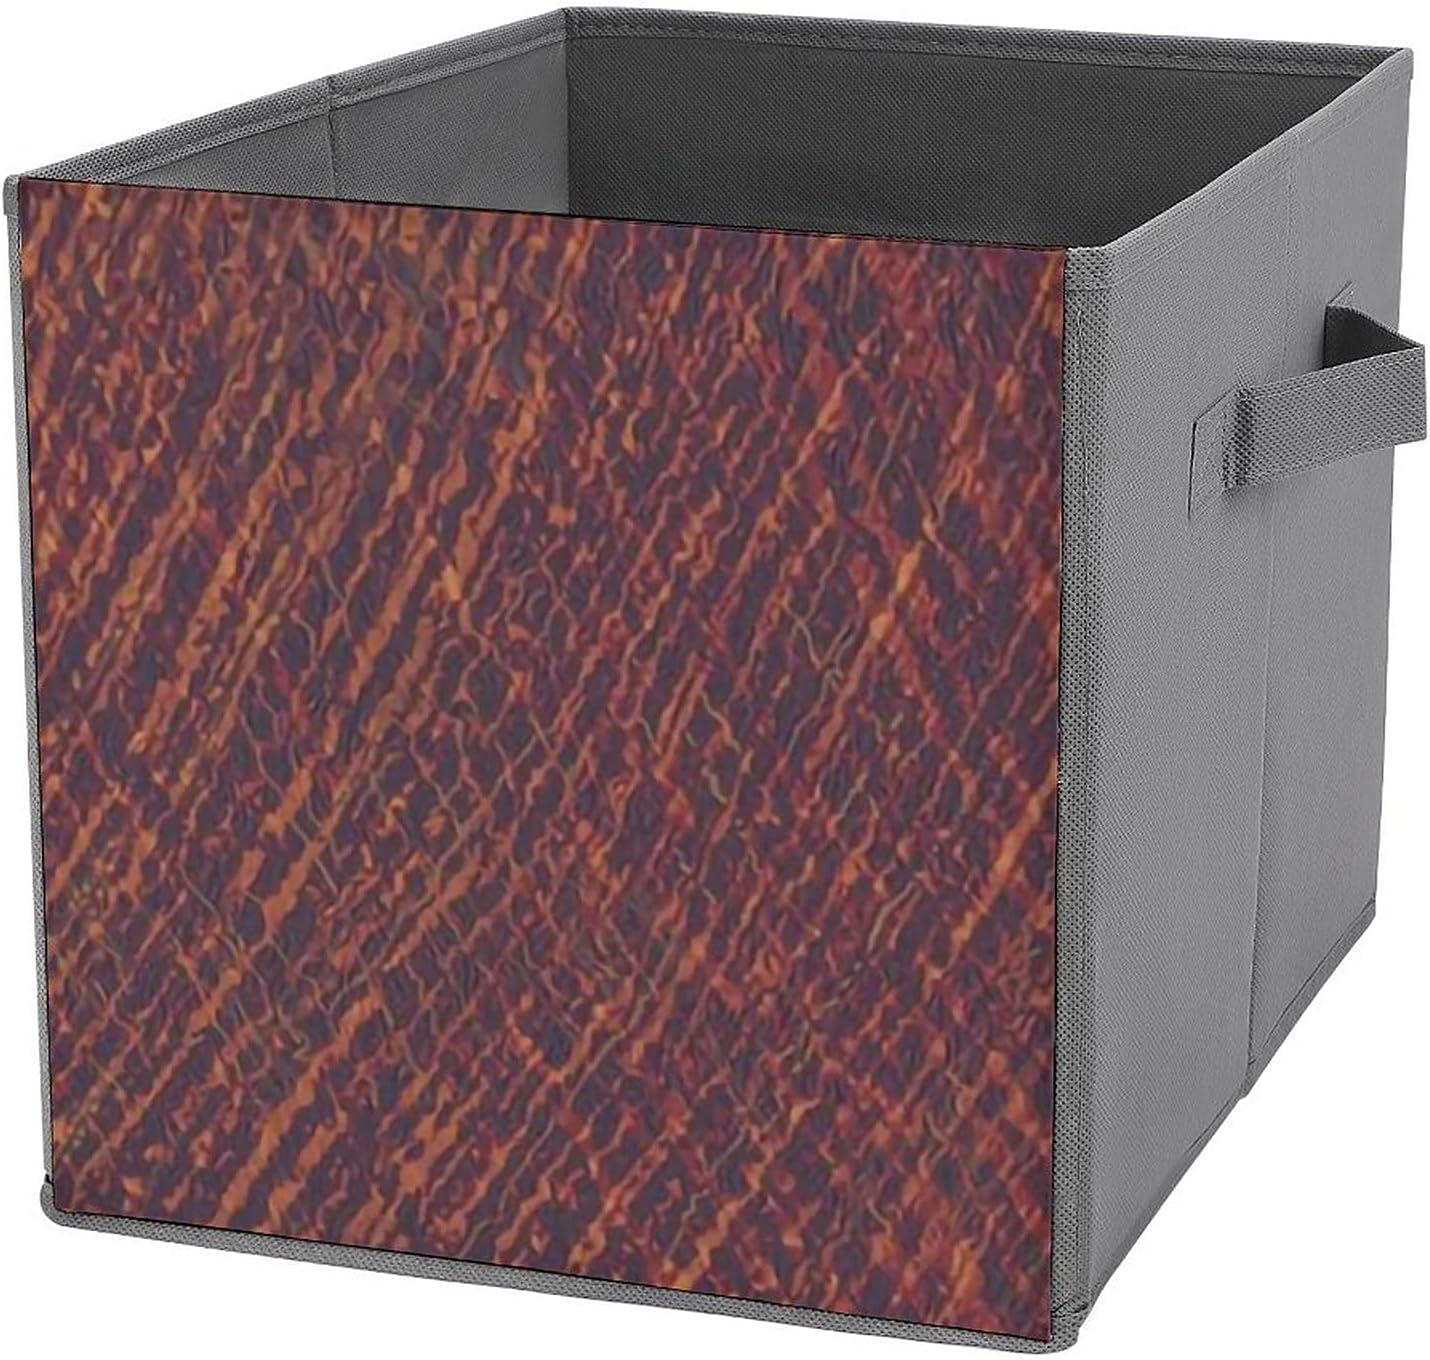 MMJUI Crosshatch Marsala Caramel High quality Storage Sales results No. 1 Folding Collapsibl Bins